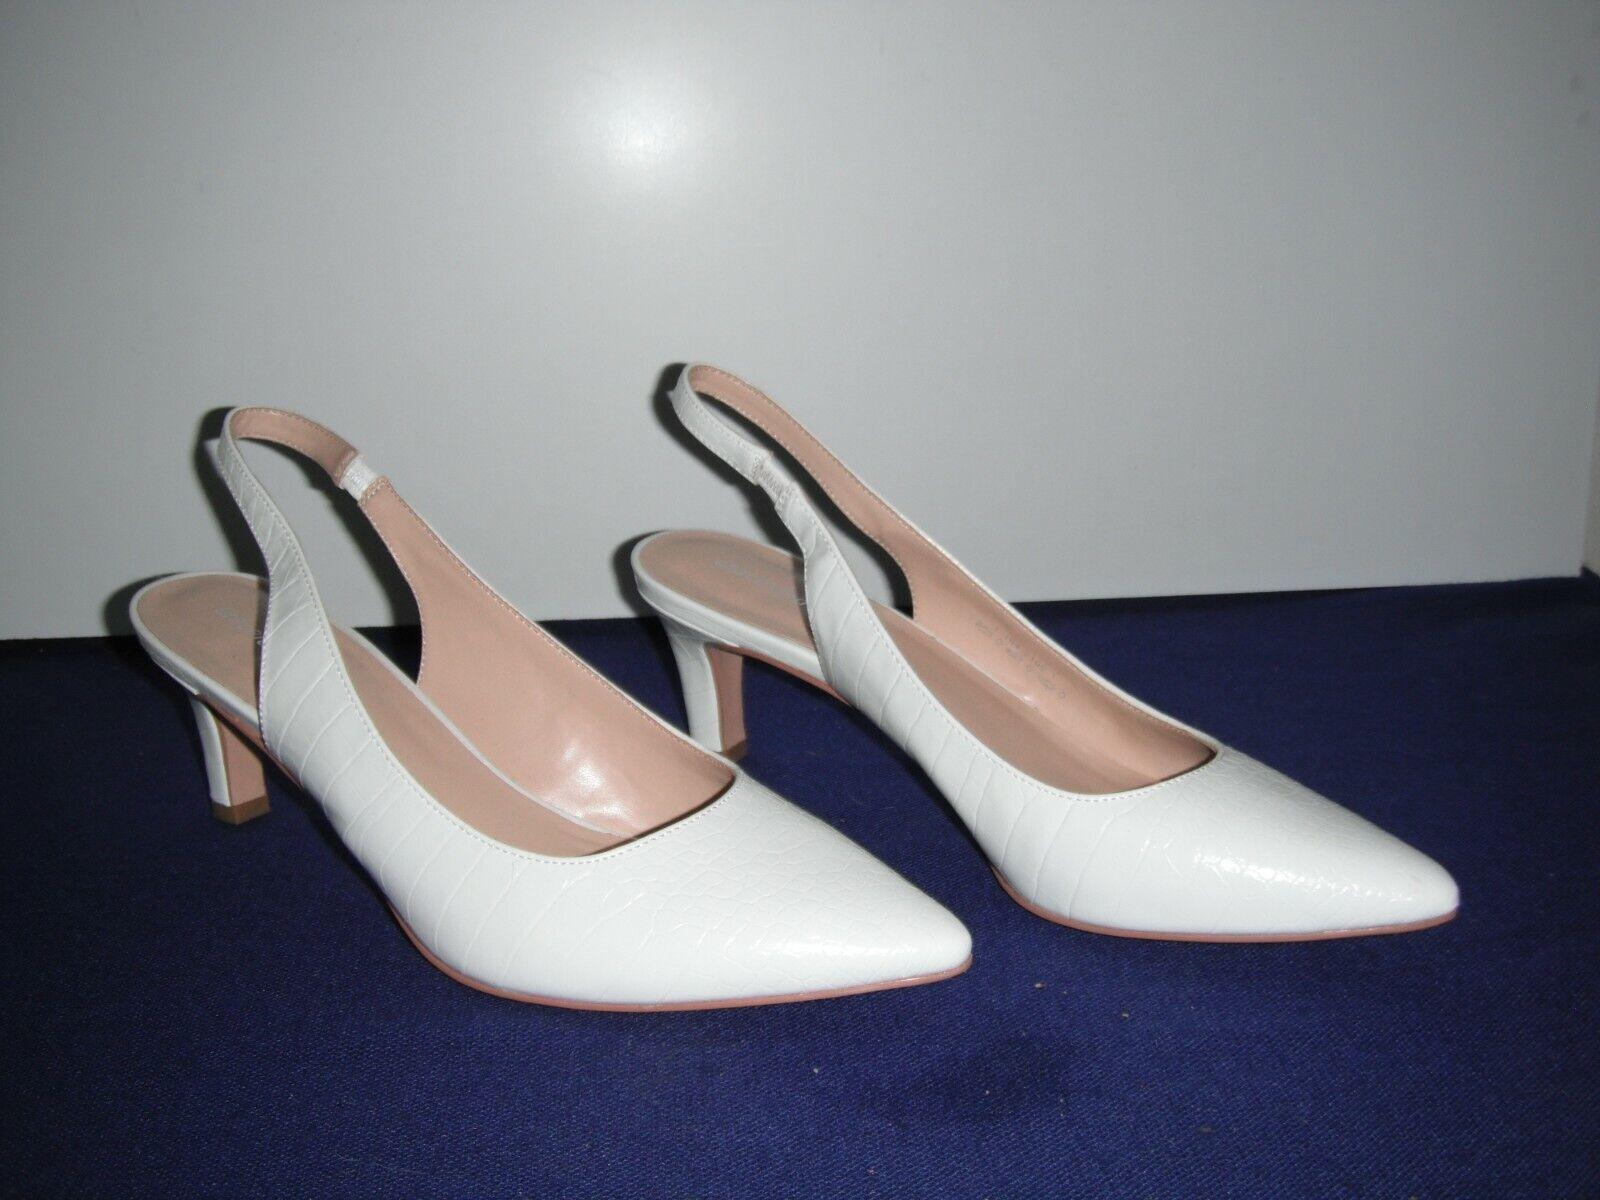 Beautiful Bridal Shoes White Heels Size 41 NEW